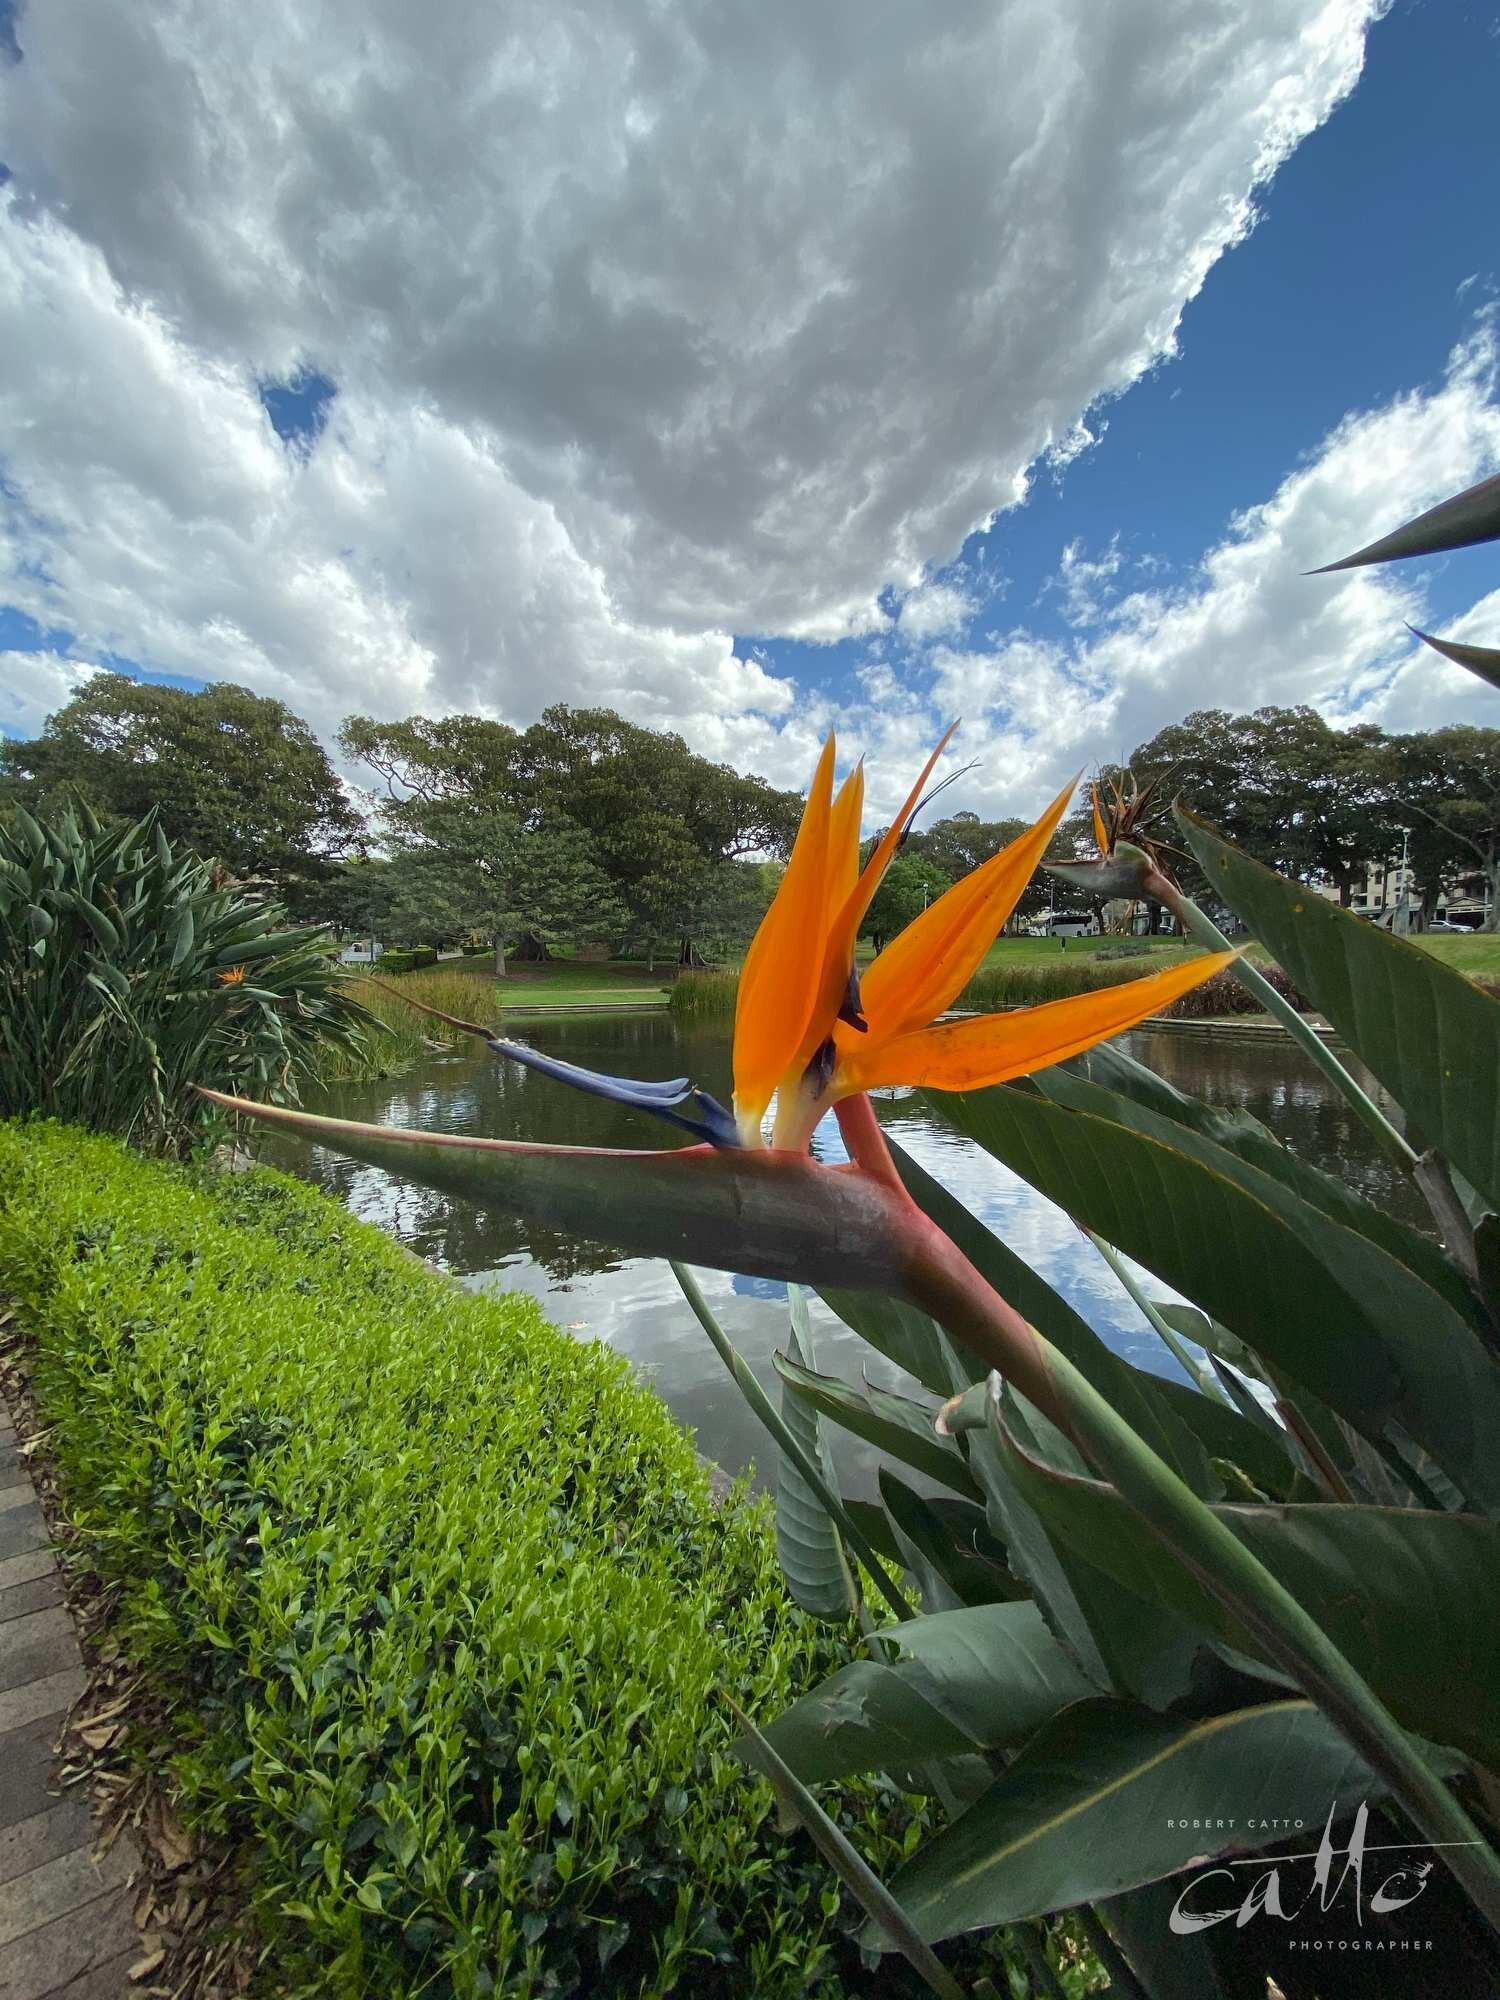 Bird of Paradise flower, Victoria Park, Sydney (iPhone 11 Pro - 0.5x wide lens)